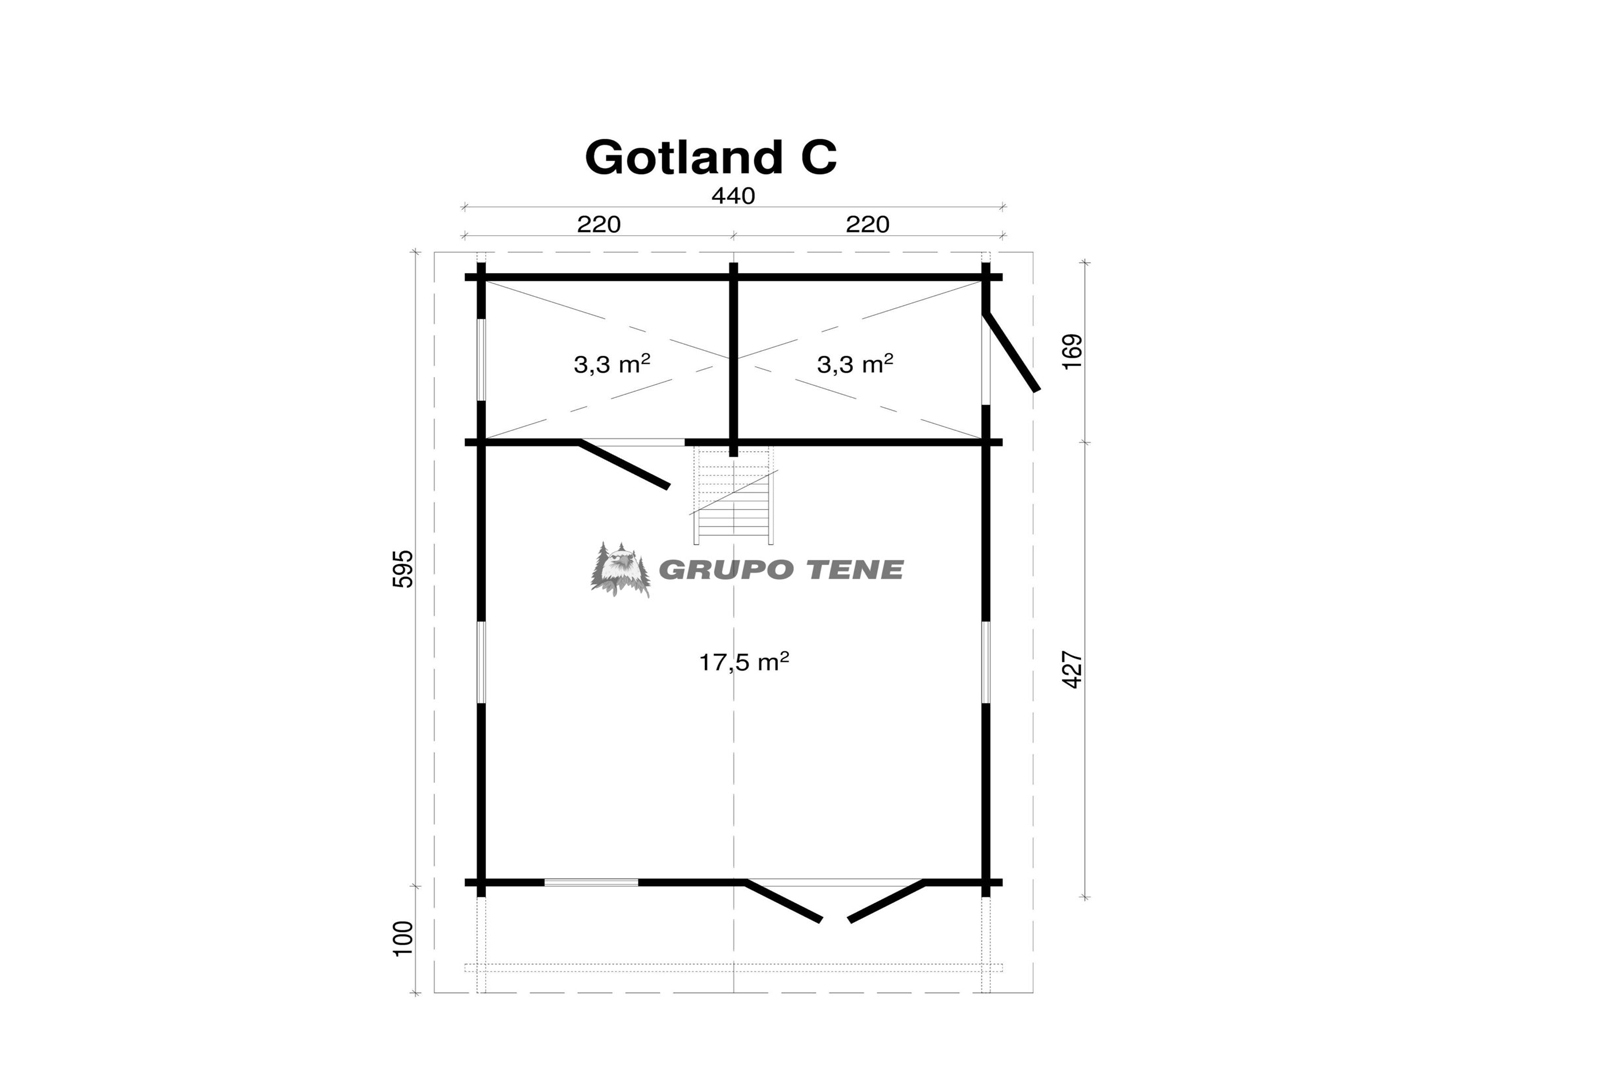 plano gotland c